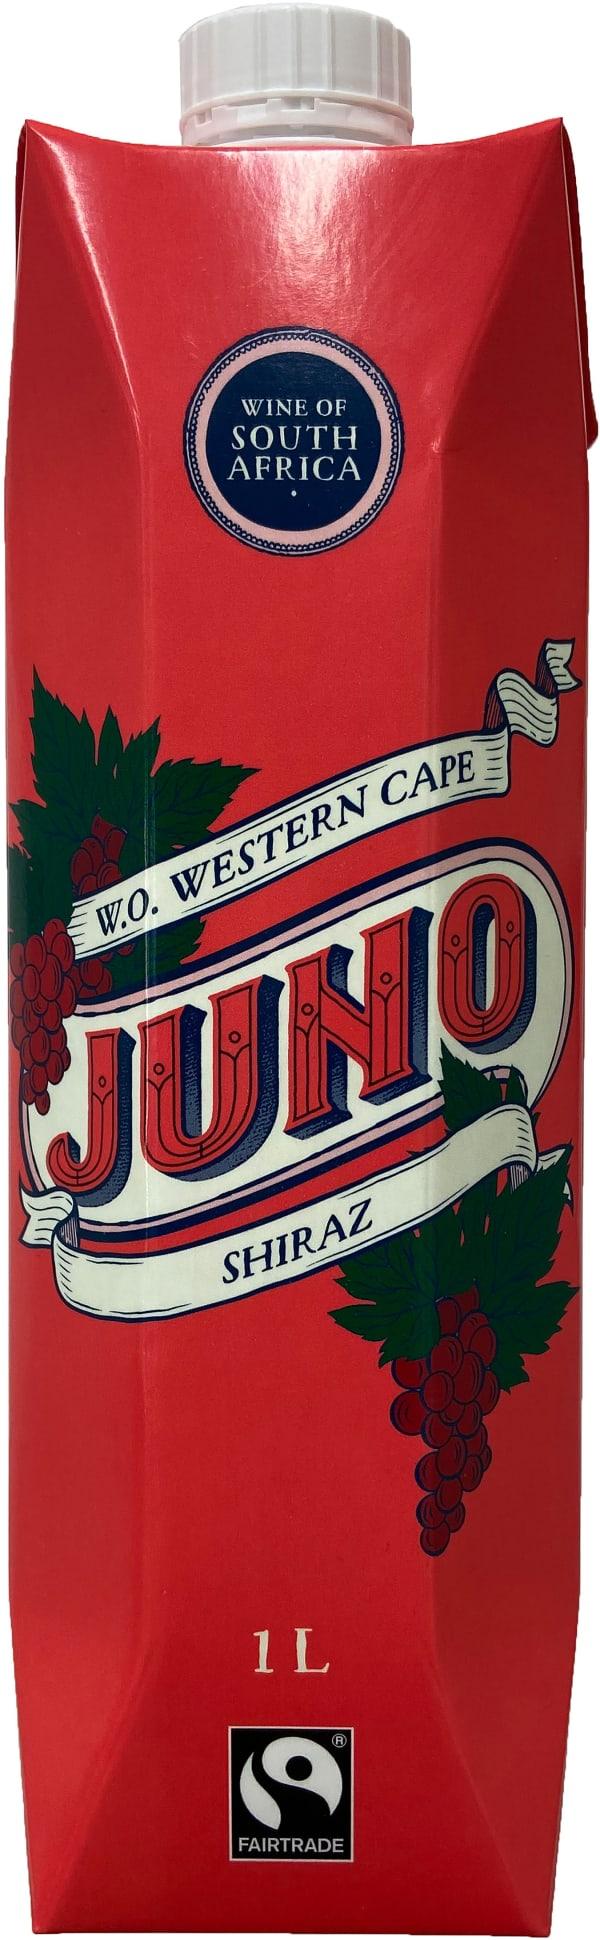 Juno Shiraz 2019 carton package